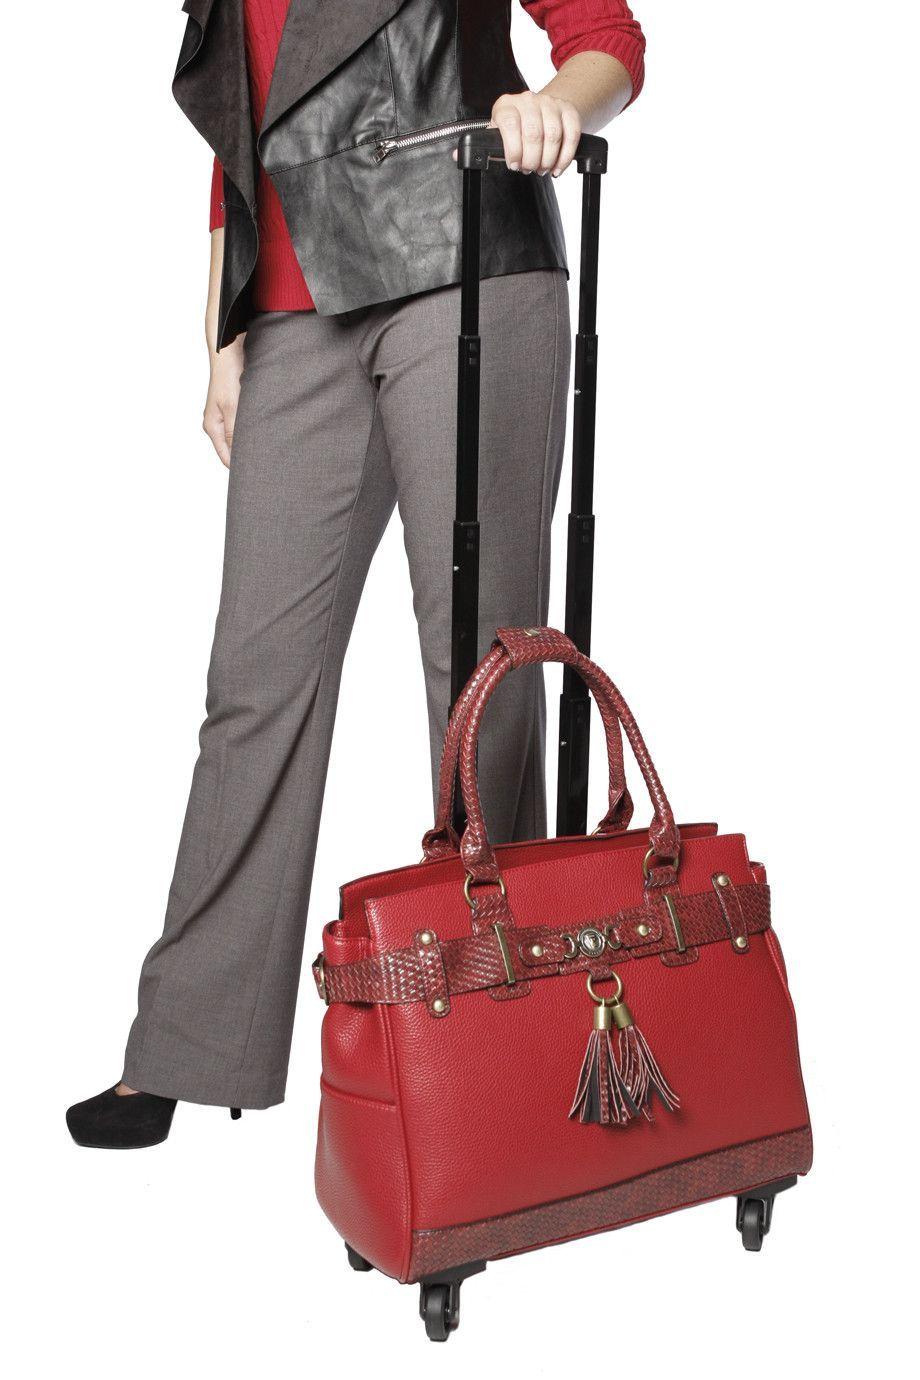 Black Executive Compu Briefcase Laptop Bag Case HIGH END W//Pocket Leather Trim